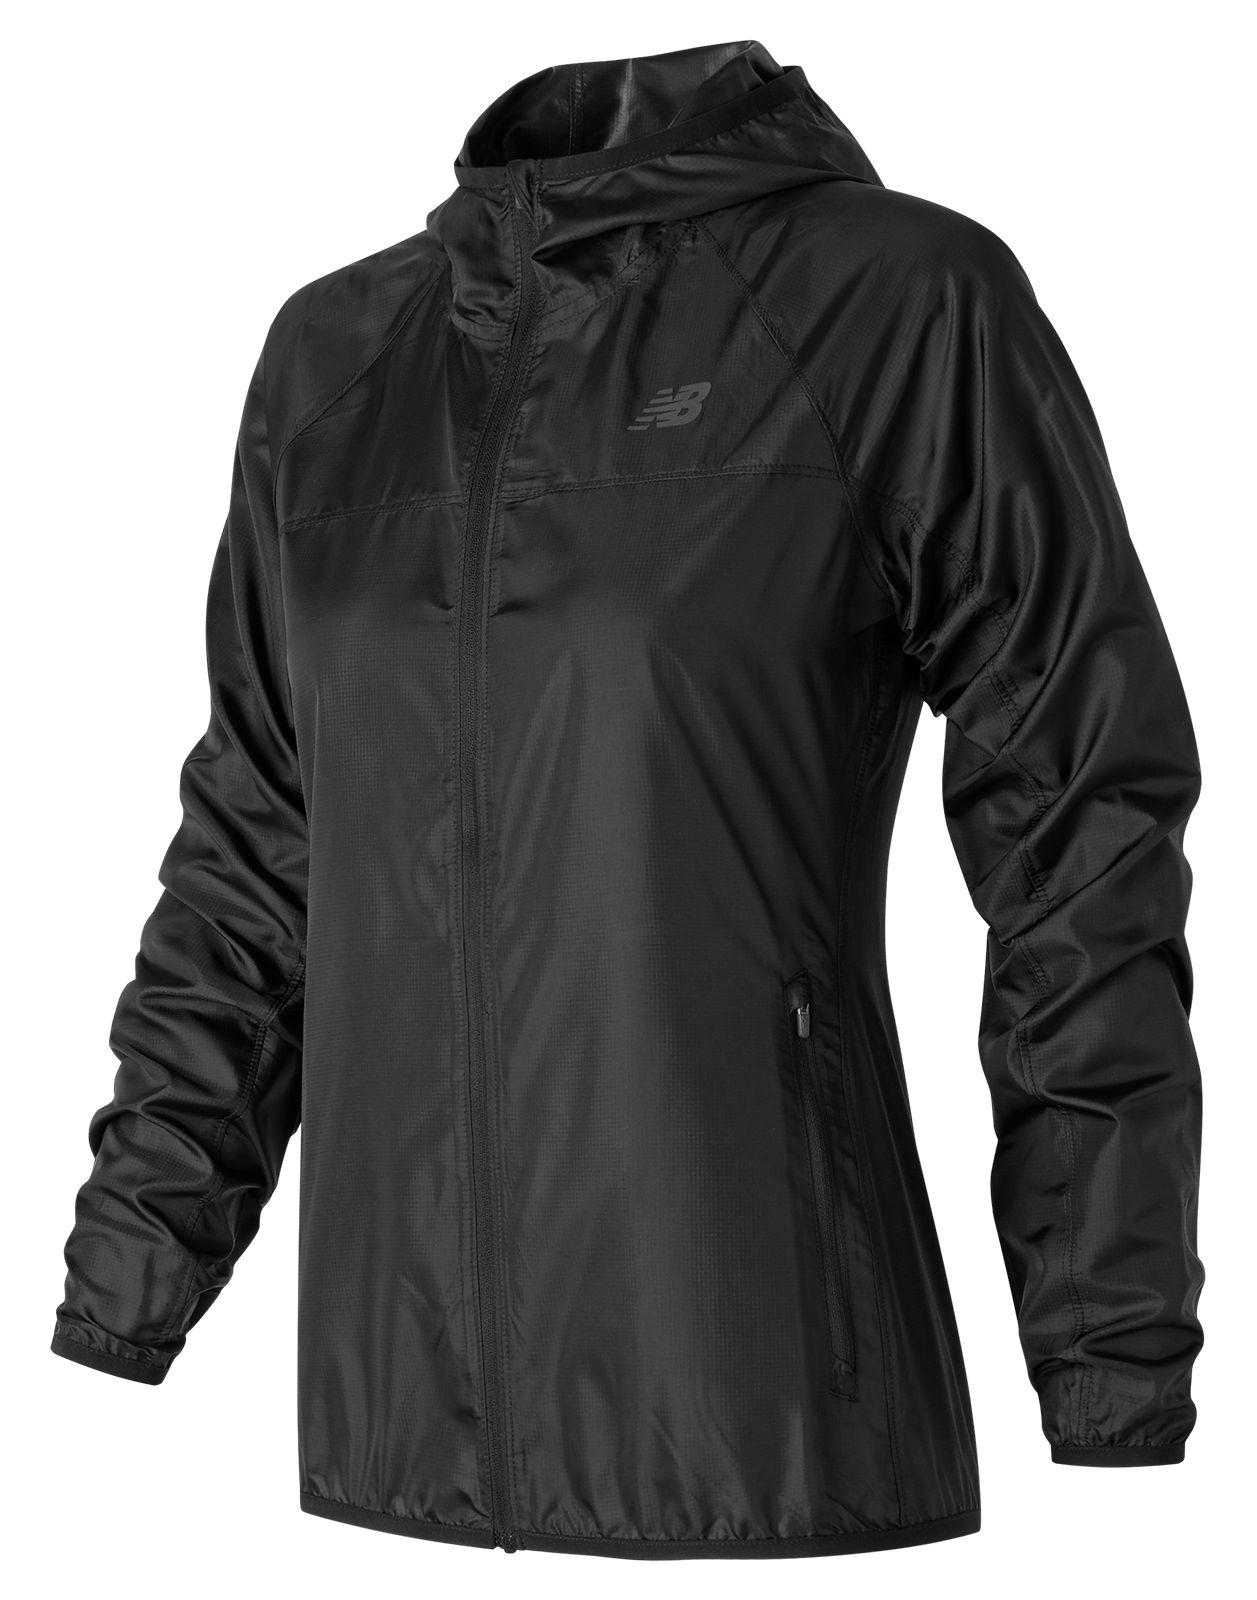 NB Windcheater Jacket, Black